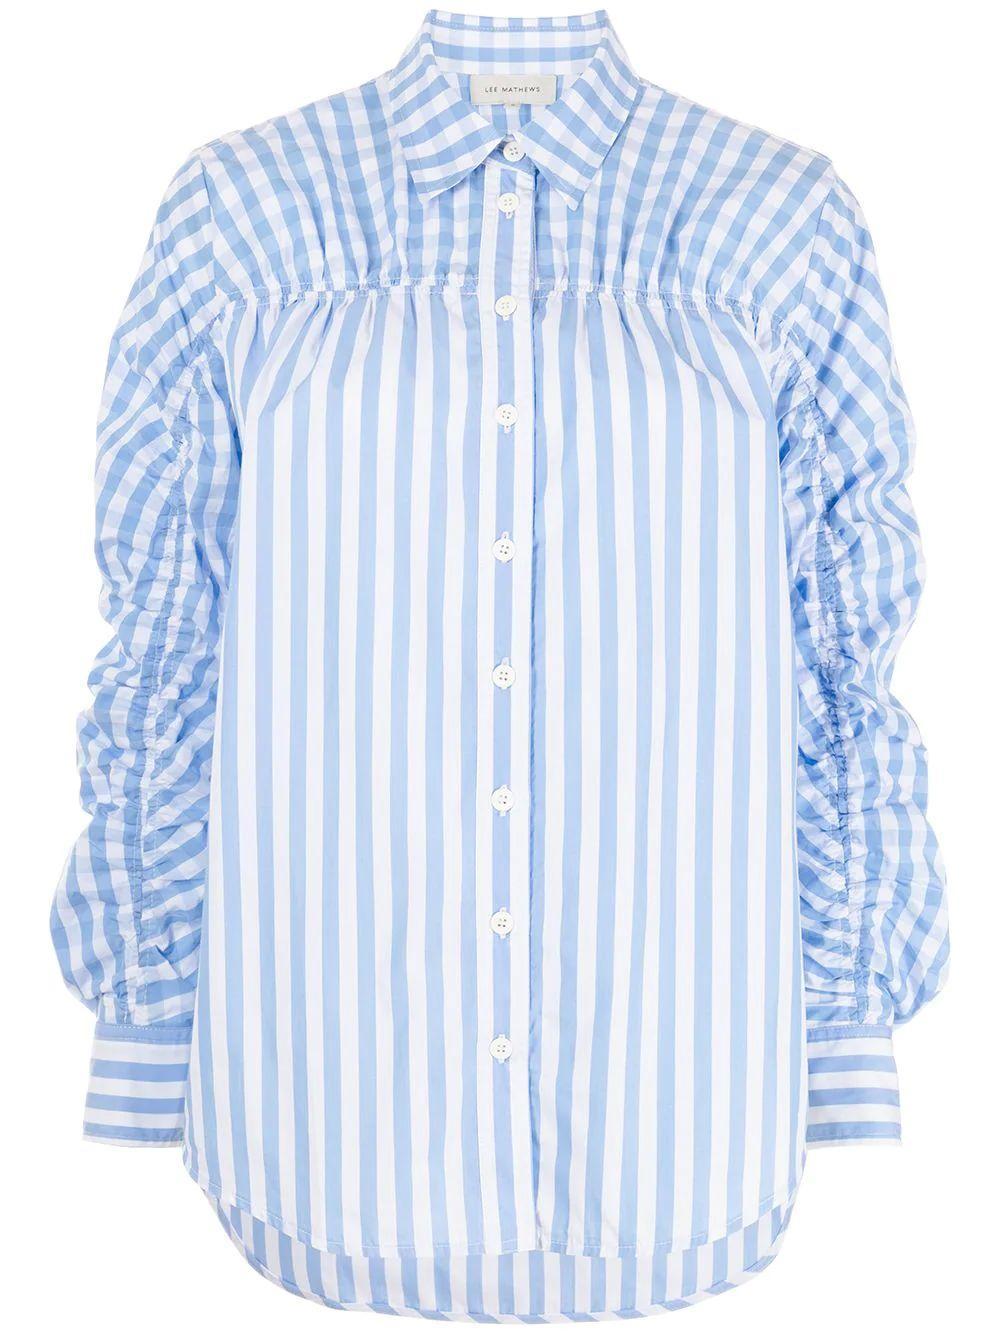 Stevie Gathered Stripe Shirt Item # M2101TO160